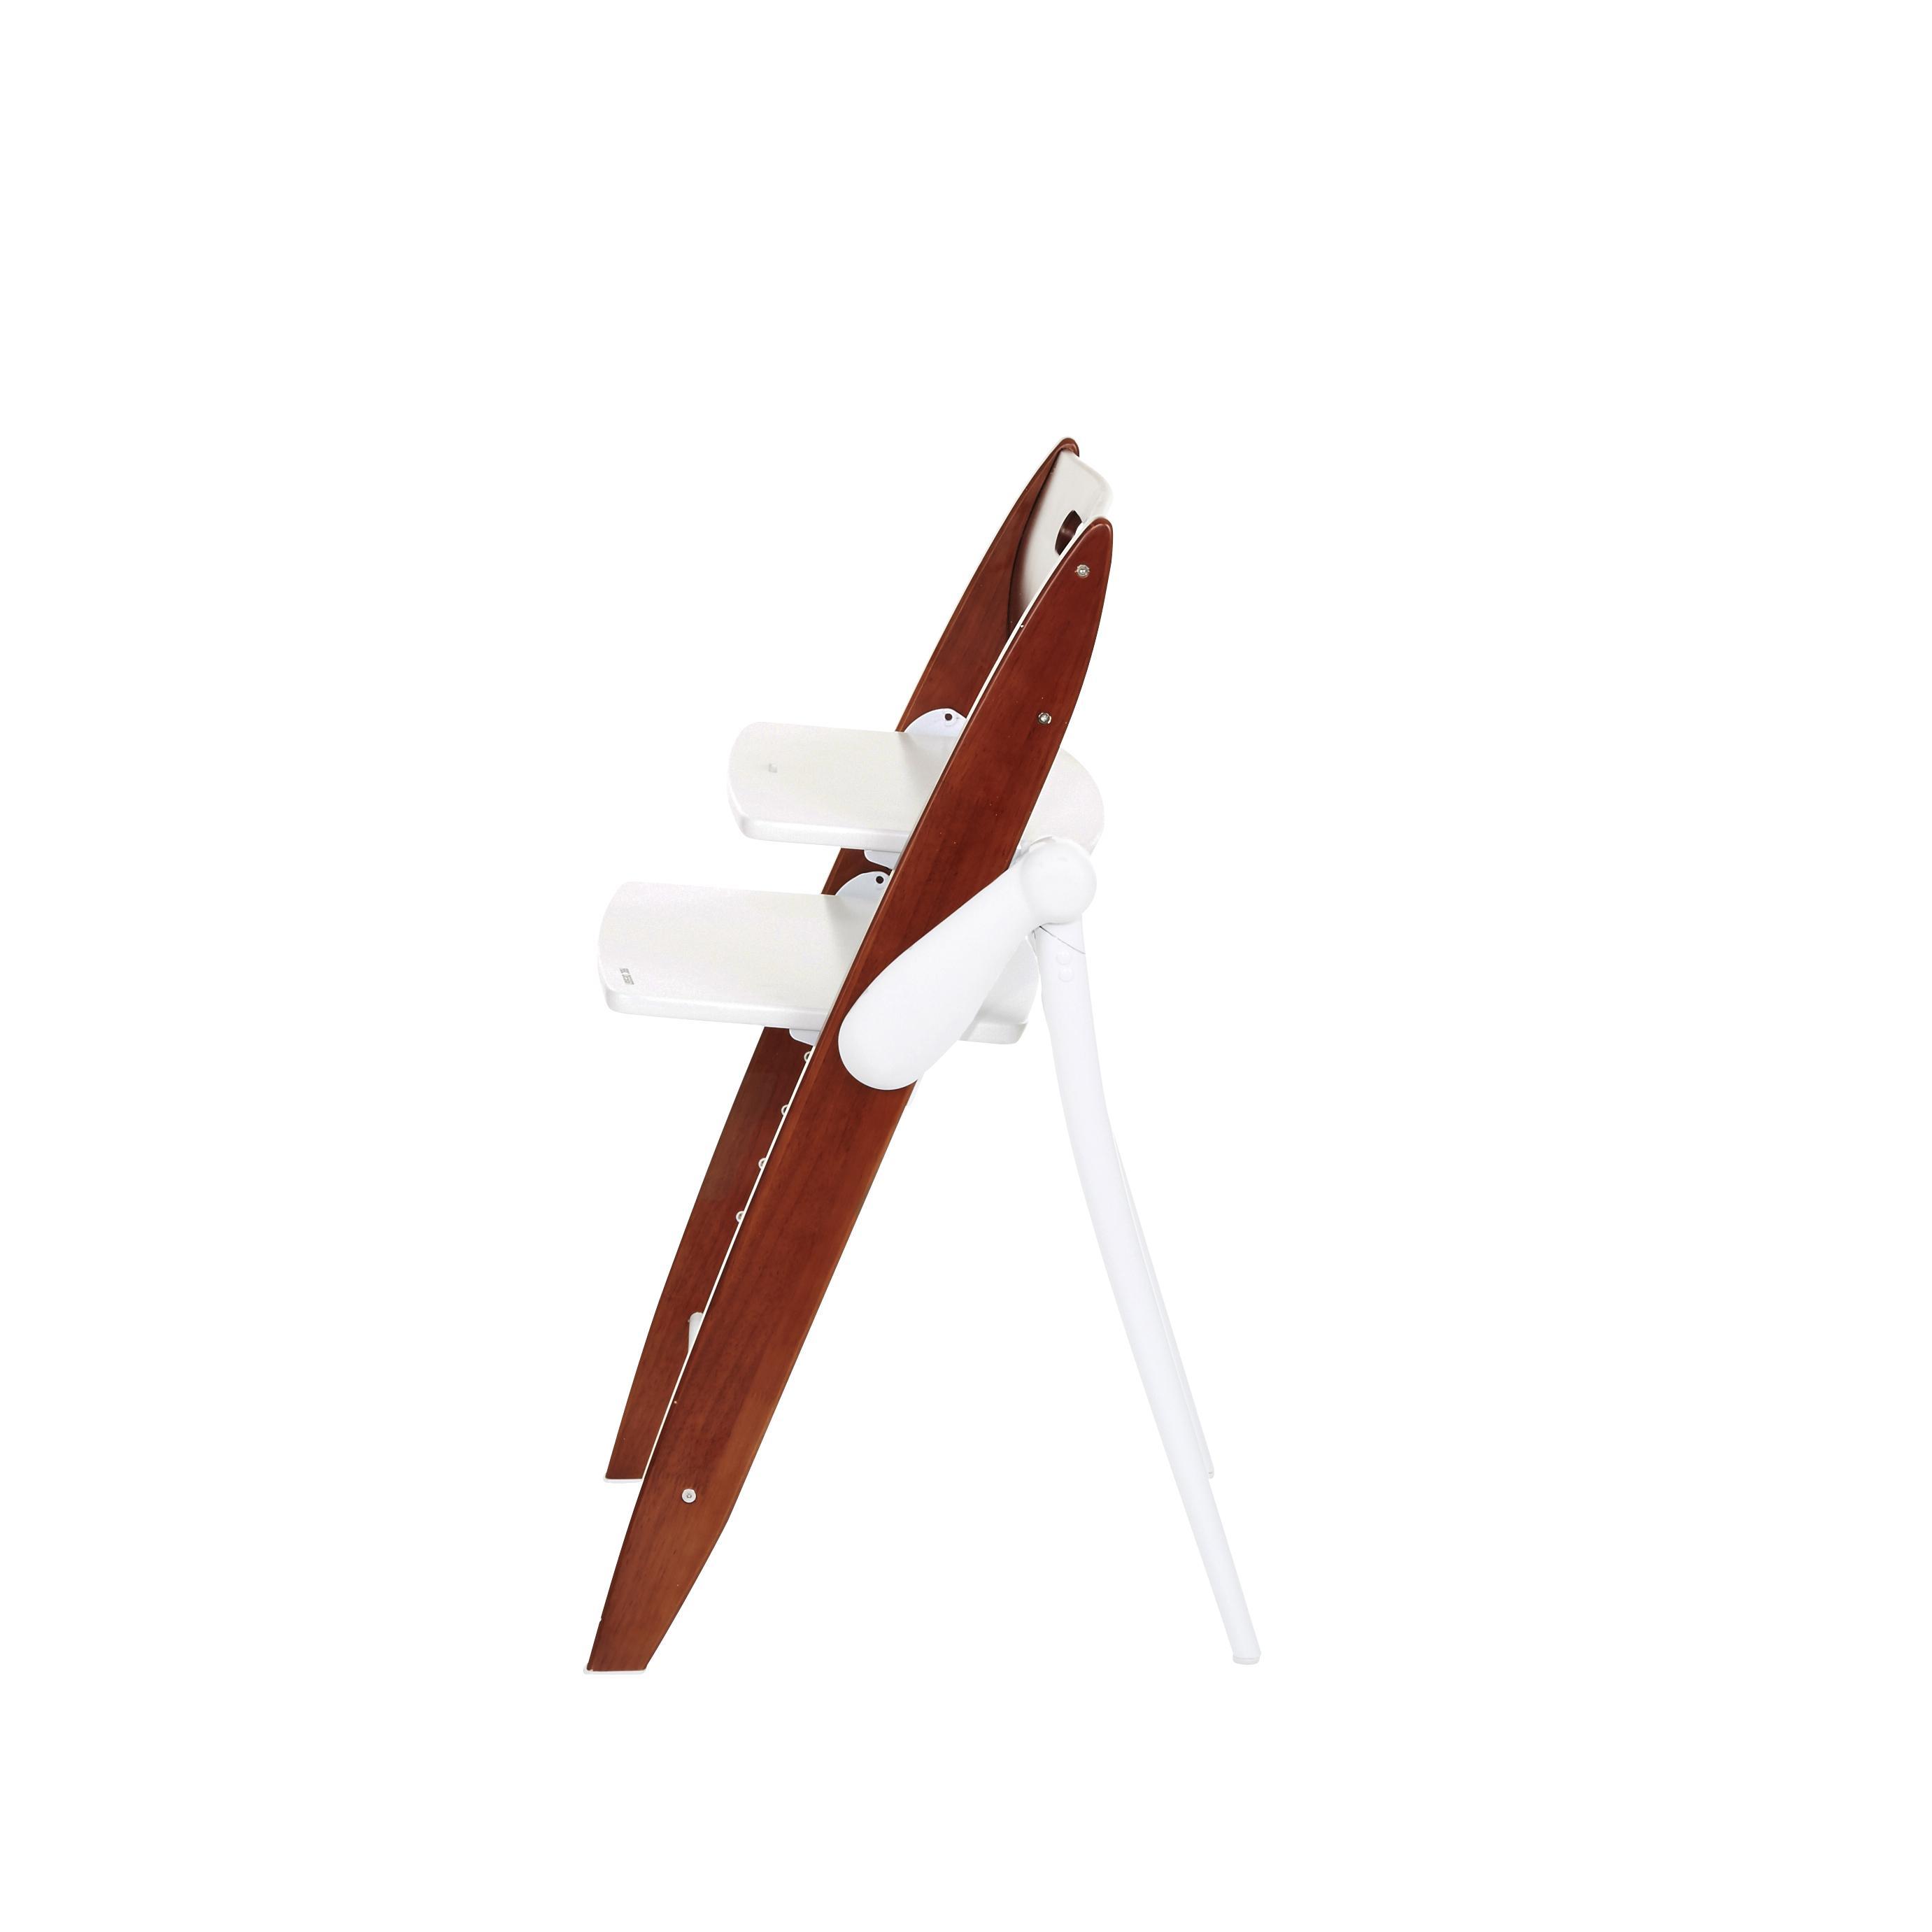 Bügel Hochstuhl Klappbar Holz Baby ab 6 Monaten ABC Design Hopper Set inkl